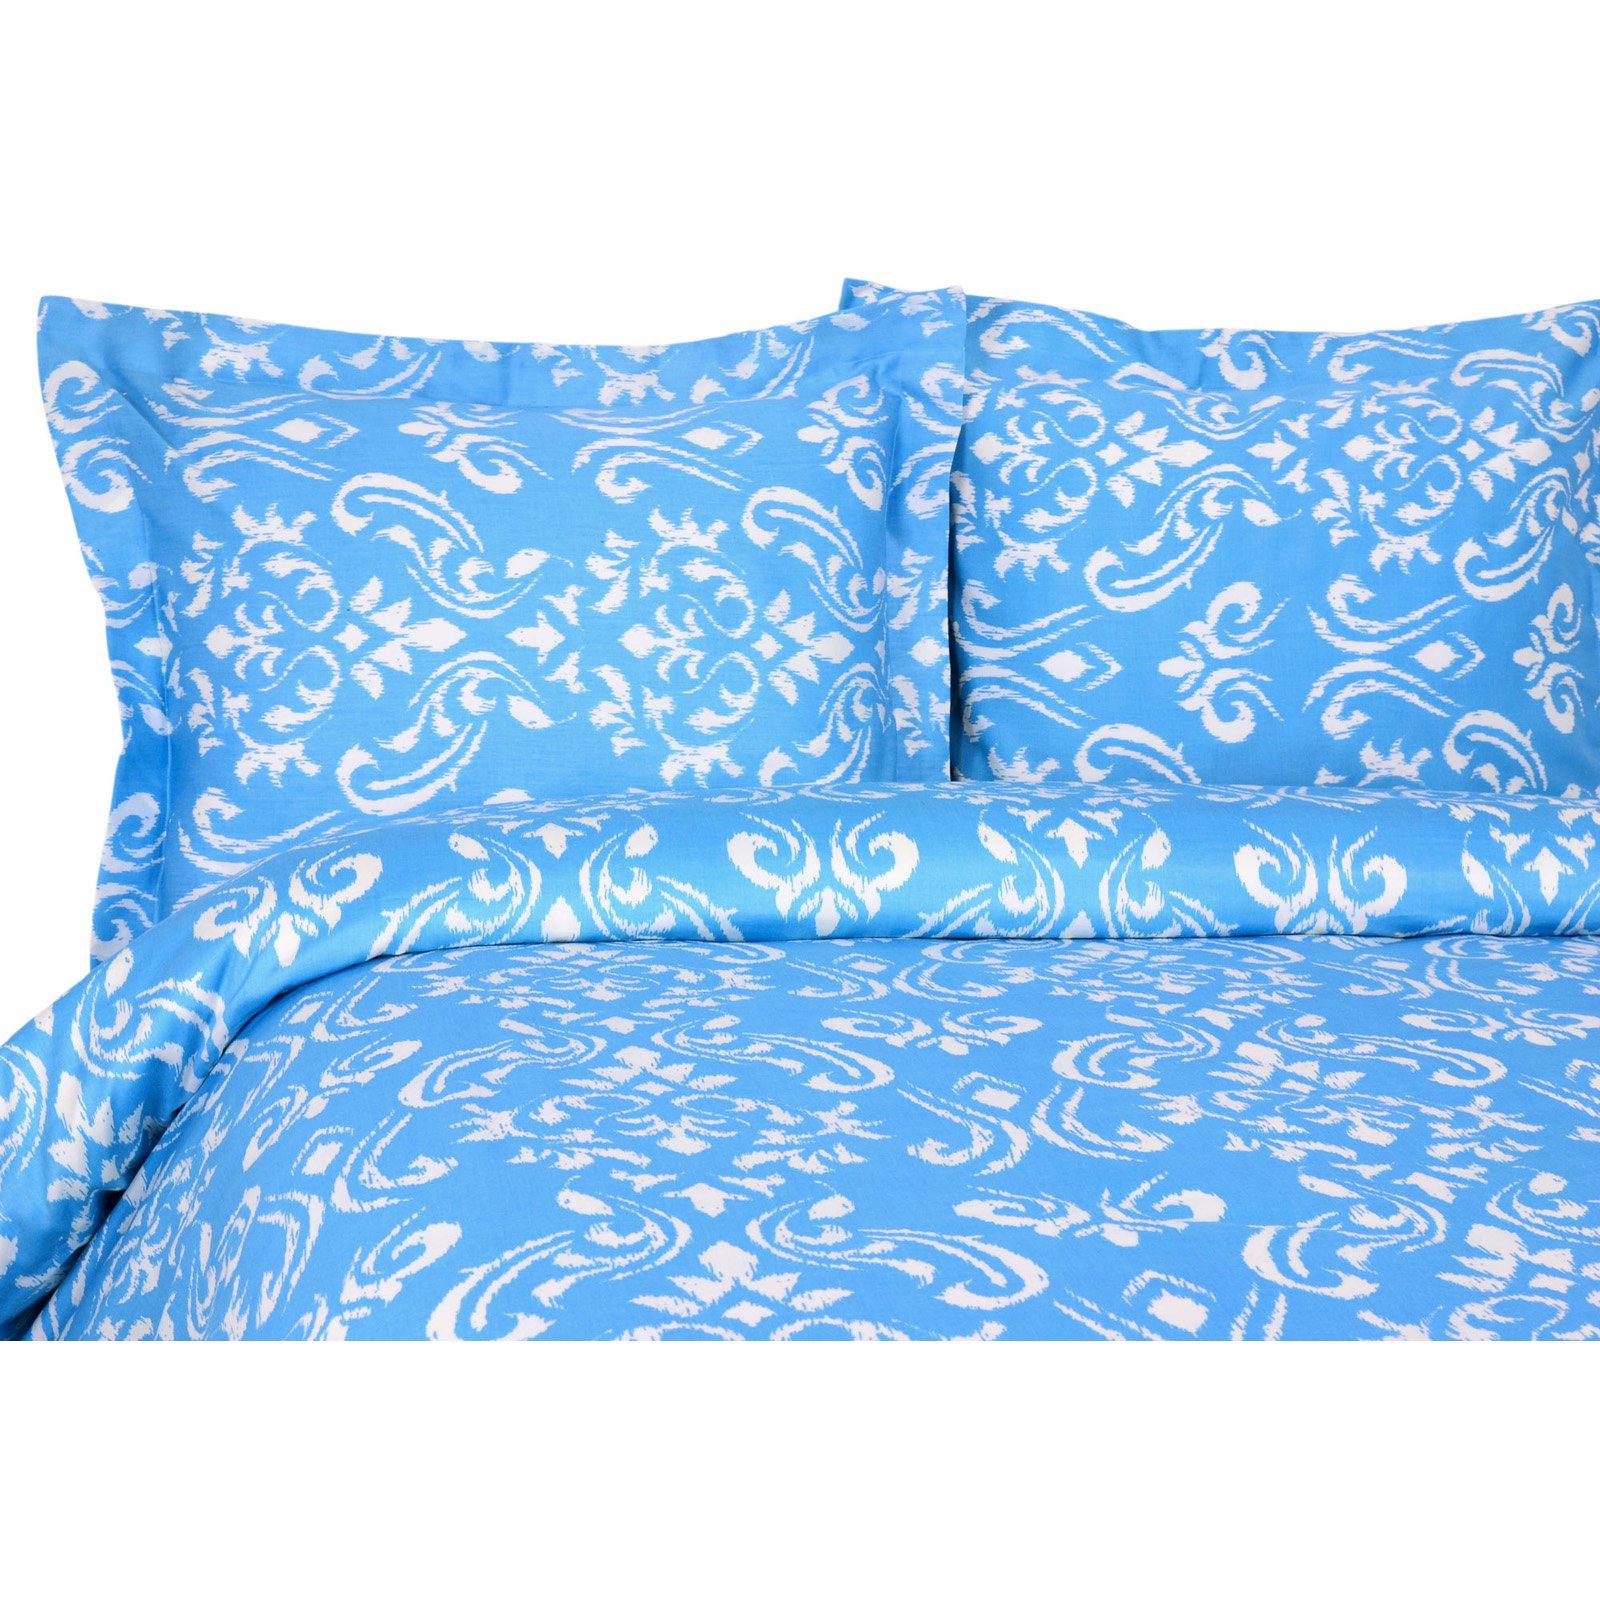 Elite Home 300 Thread Count Sicily Bedding Set